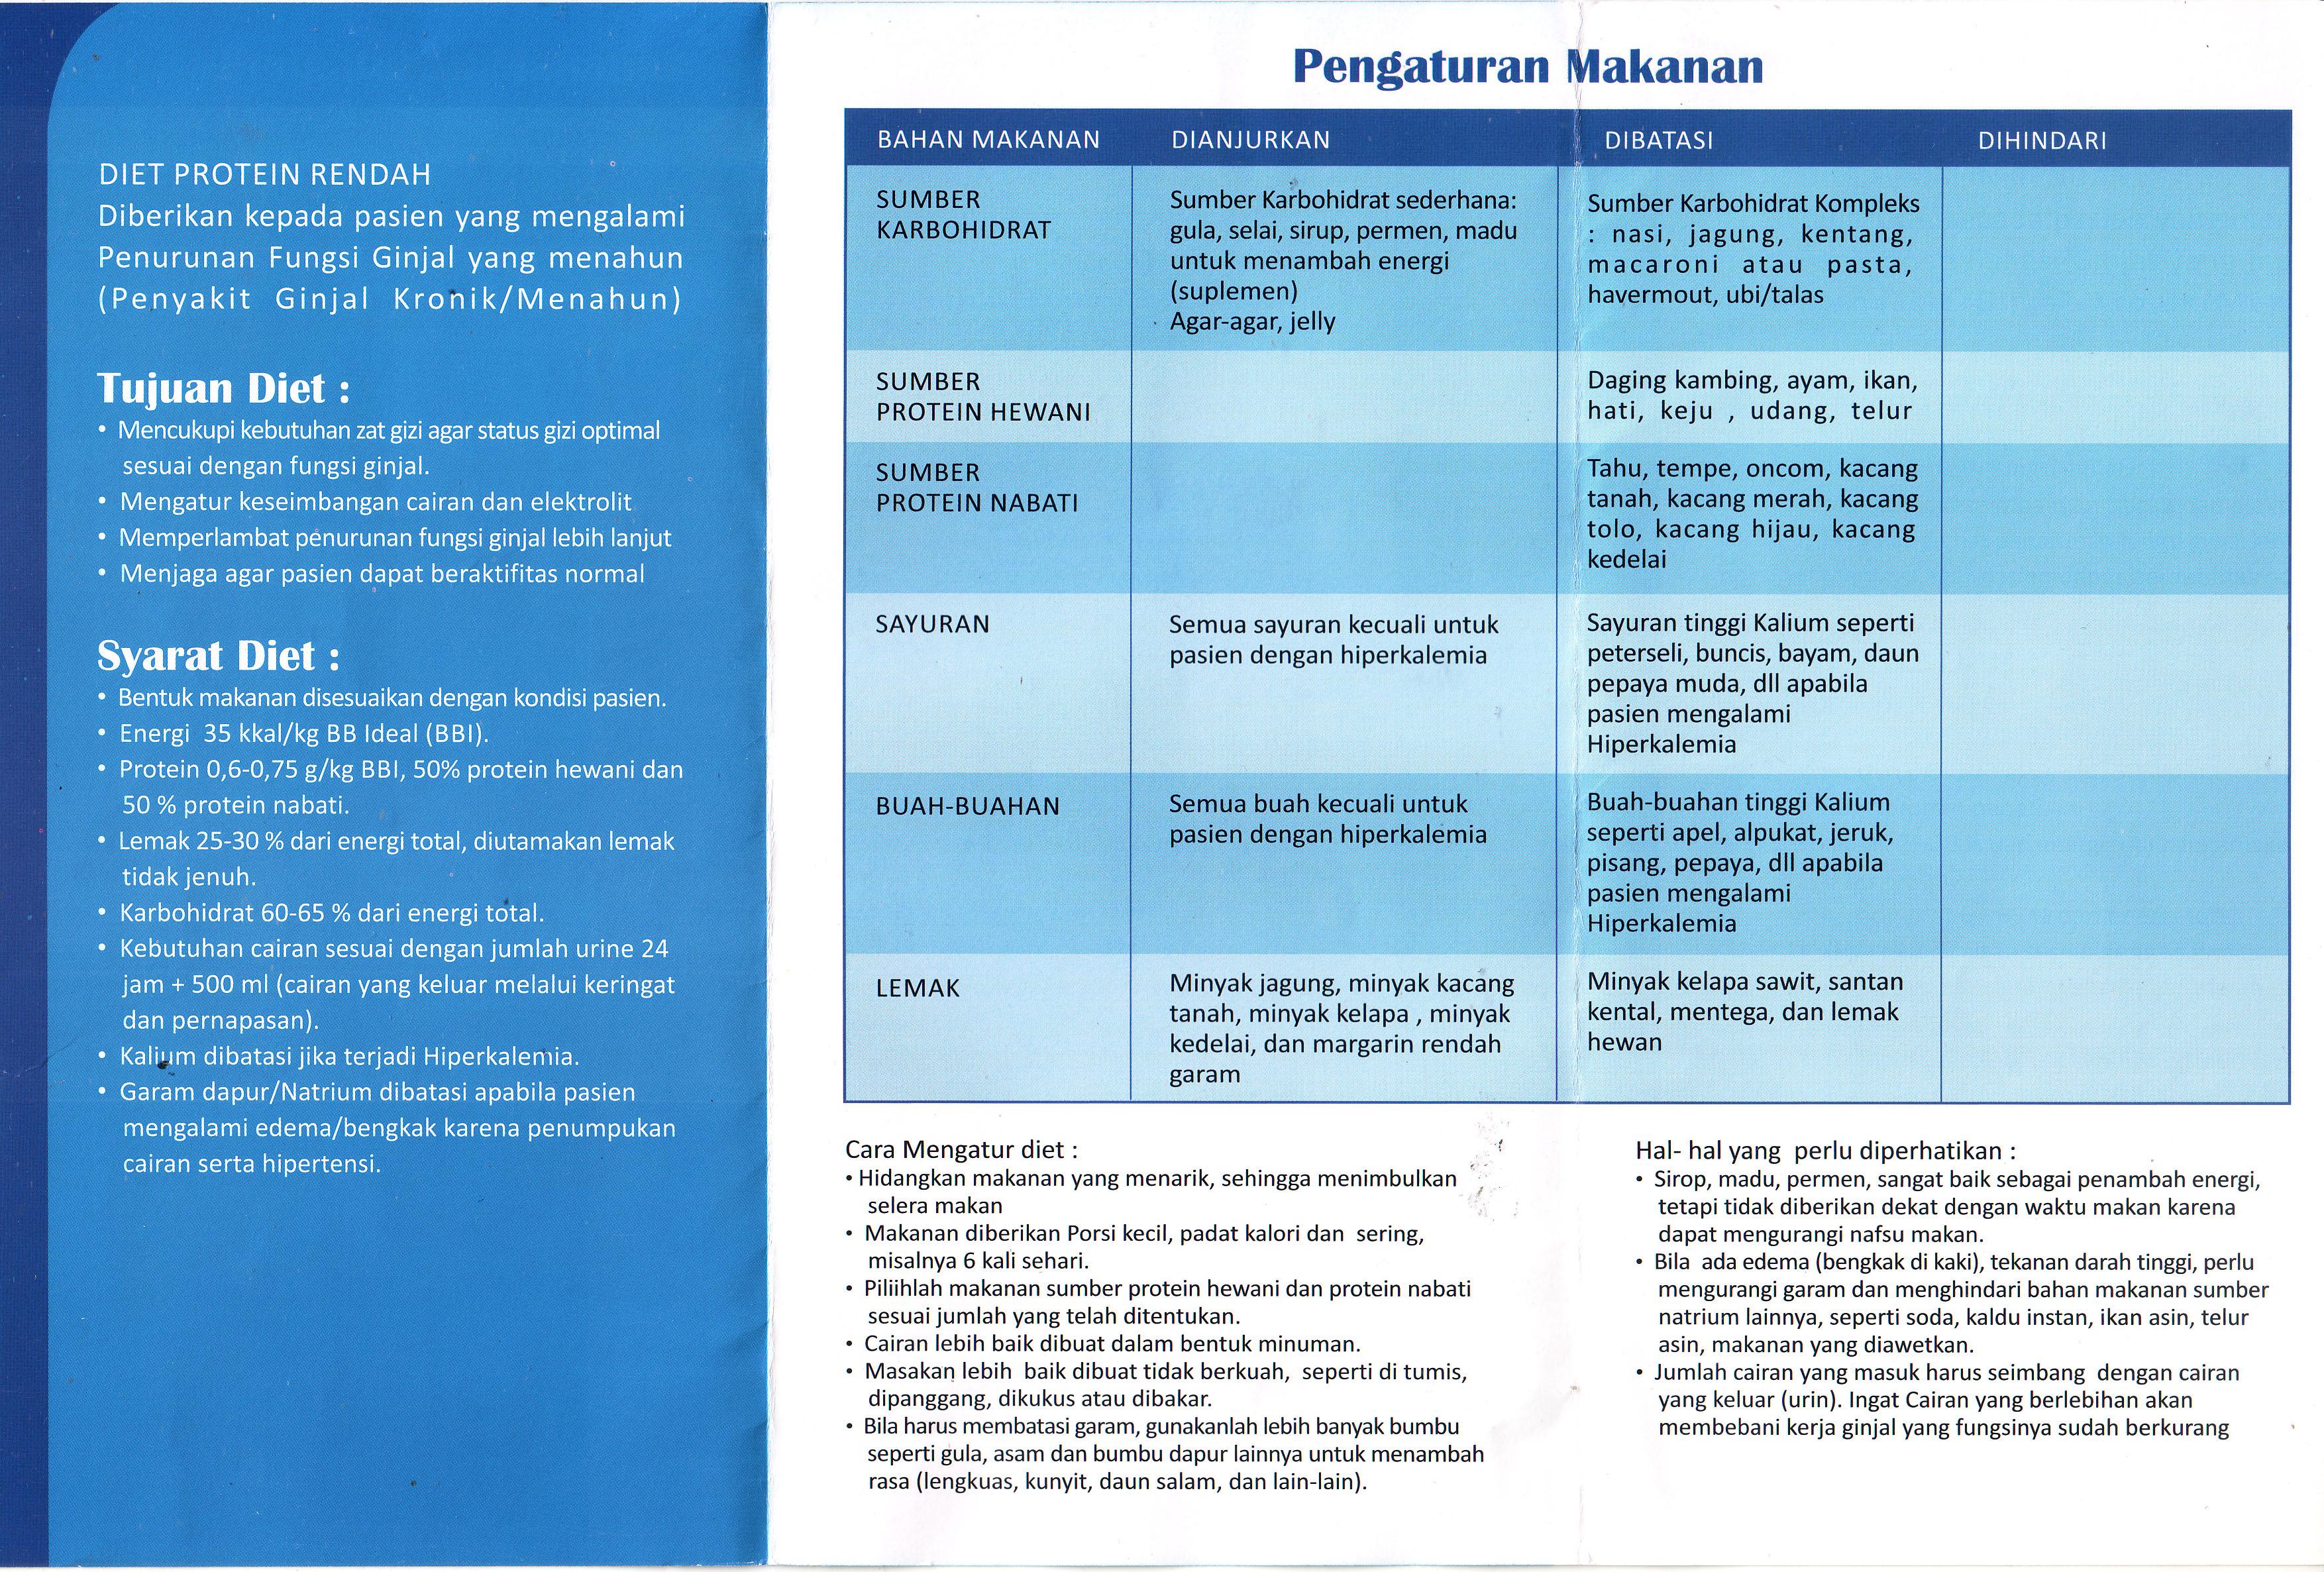 Diet Protein Rendah Untuk Penyakit Ginjal Kronik Kabupaten Bogor